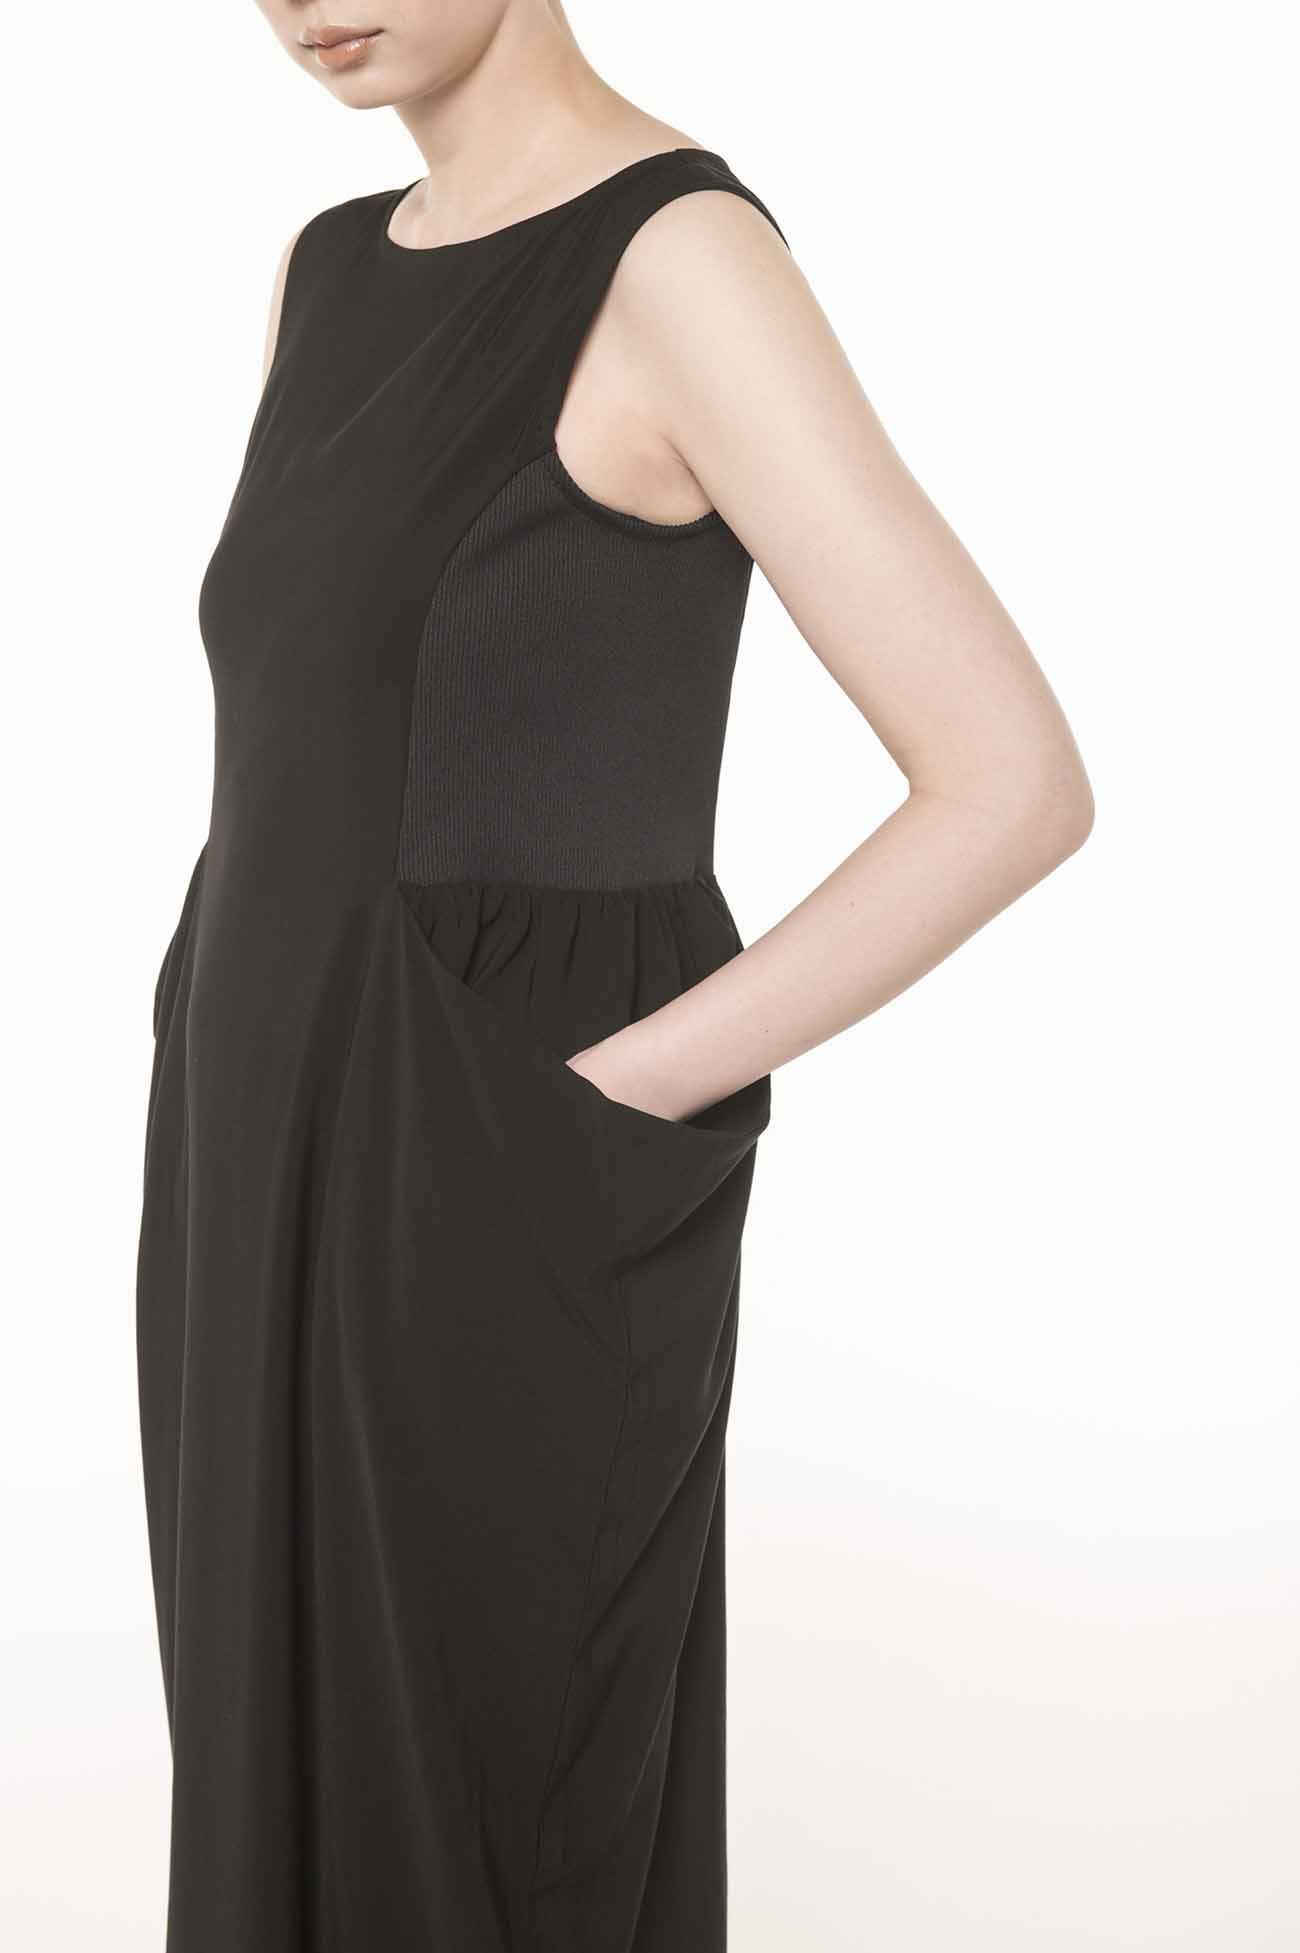 Ry/Cu ギャバタレポケットドレス